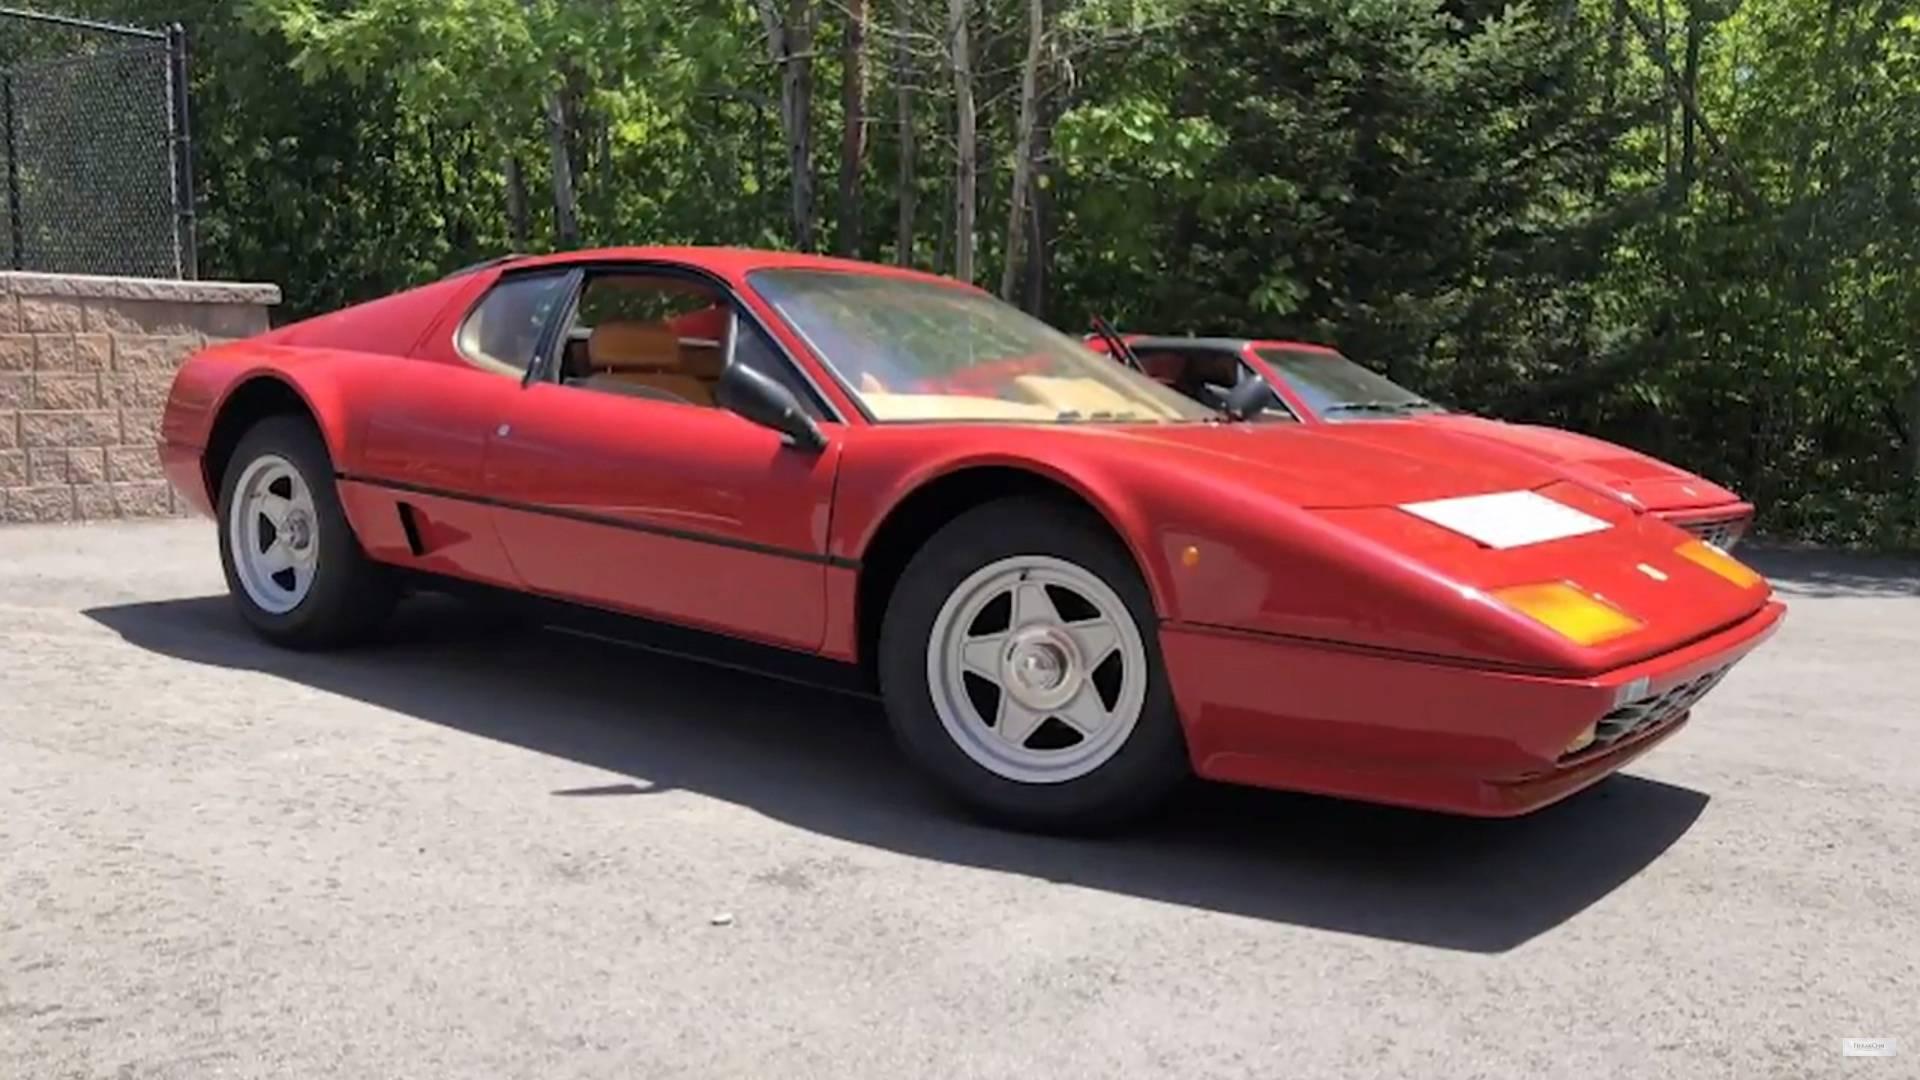 Watch This Classic Ferrari 512 Bb Get Reborn In 8 Minutes